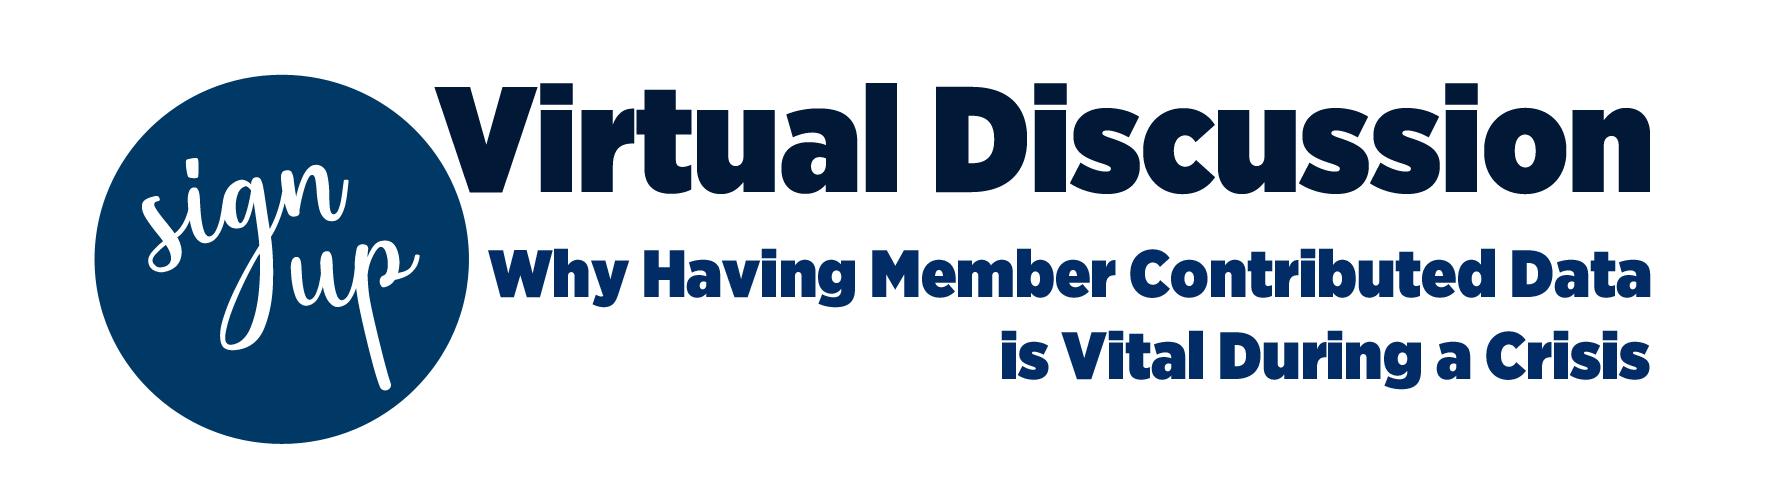 virtual discussion-1